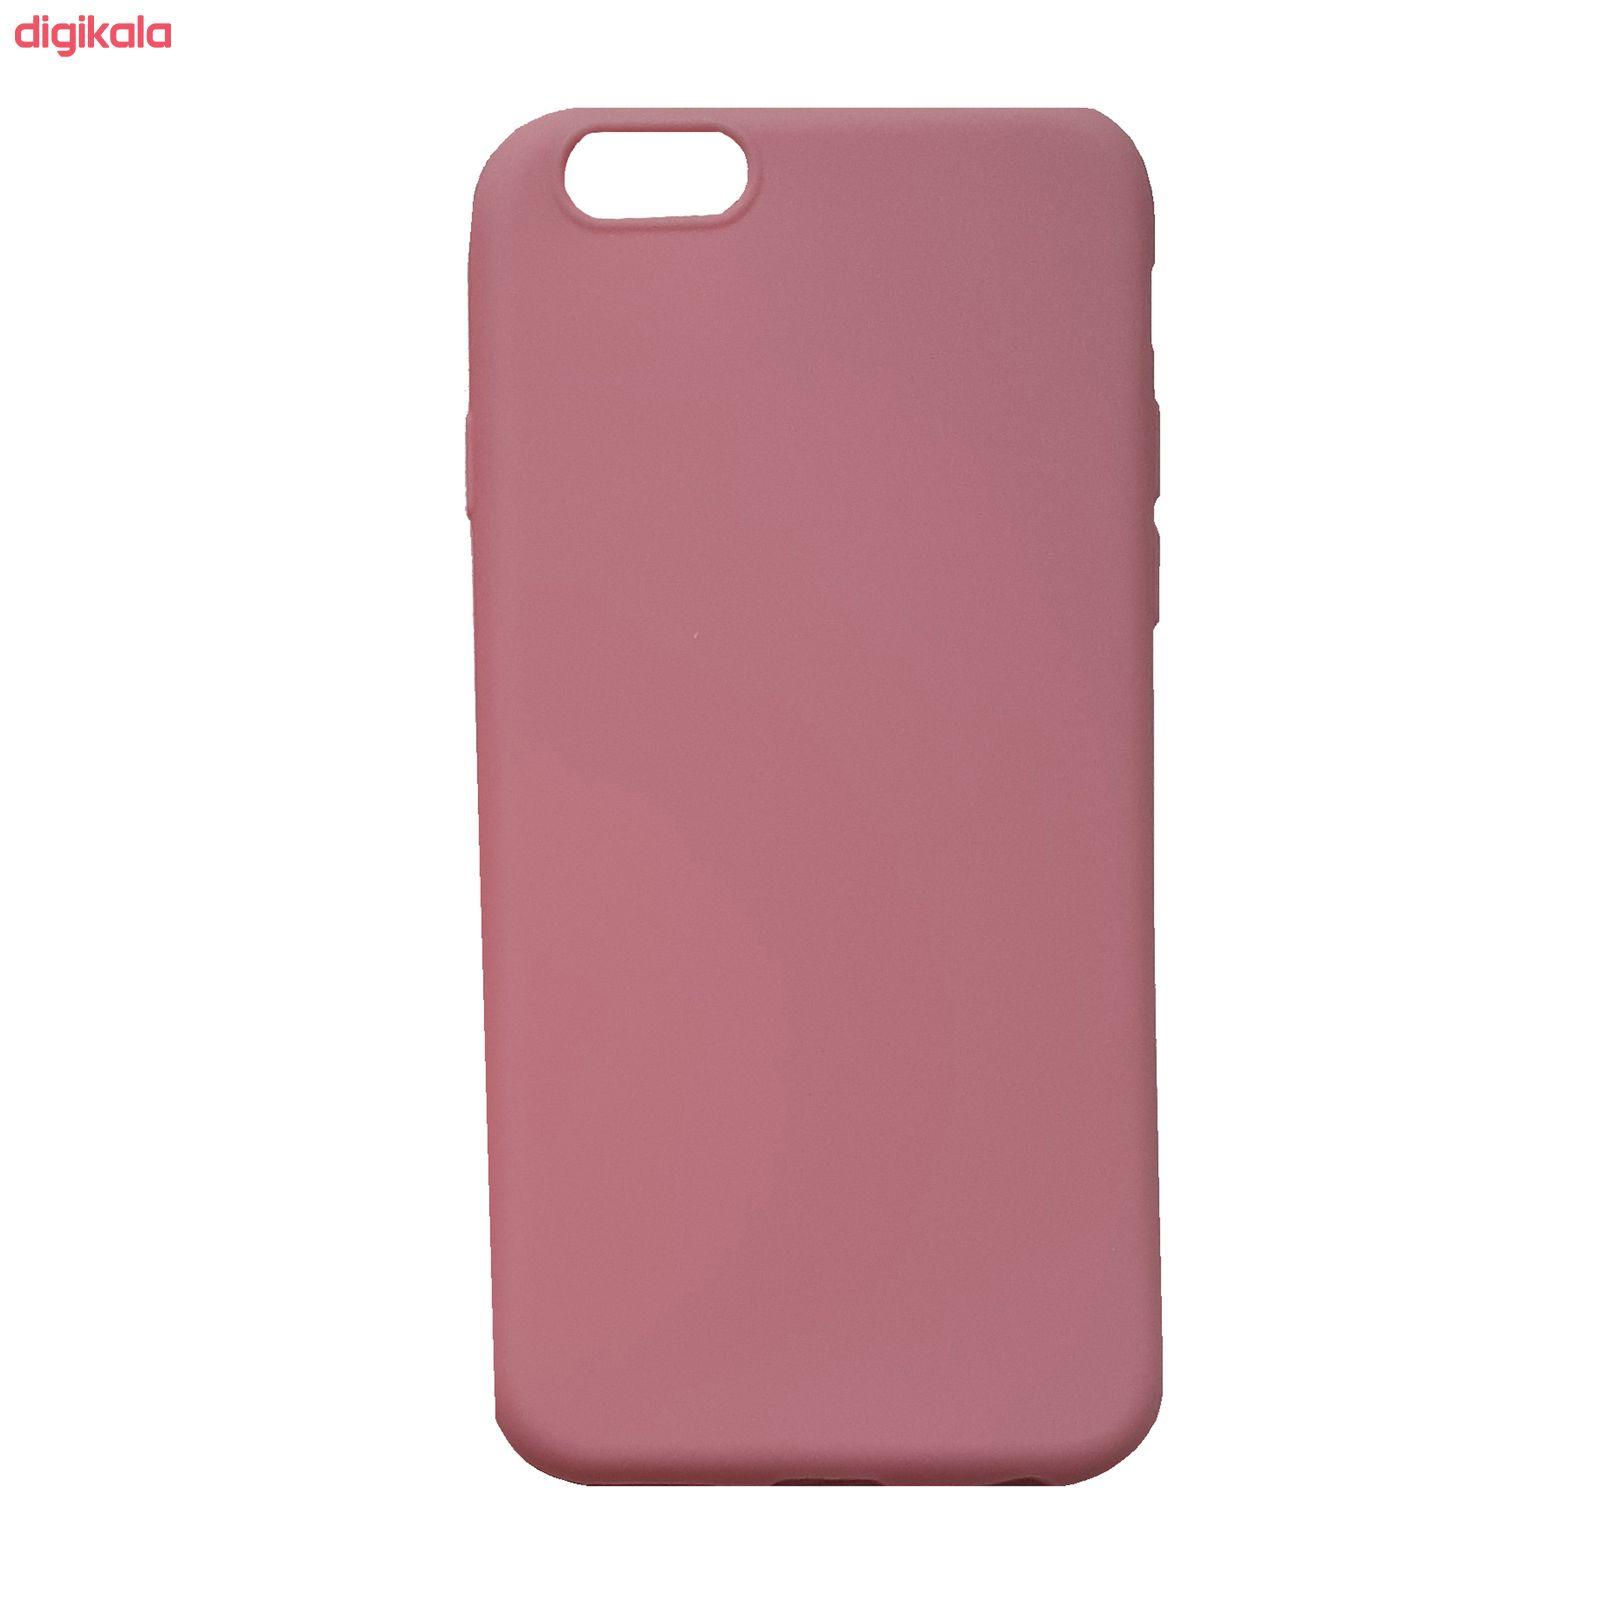 کاور مدل M-6G مناسب برای گوشی موبایل اپل iphone 6/6S main 1 1